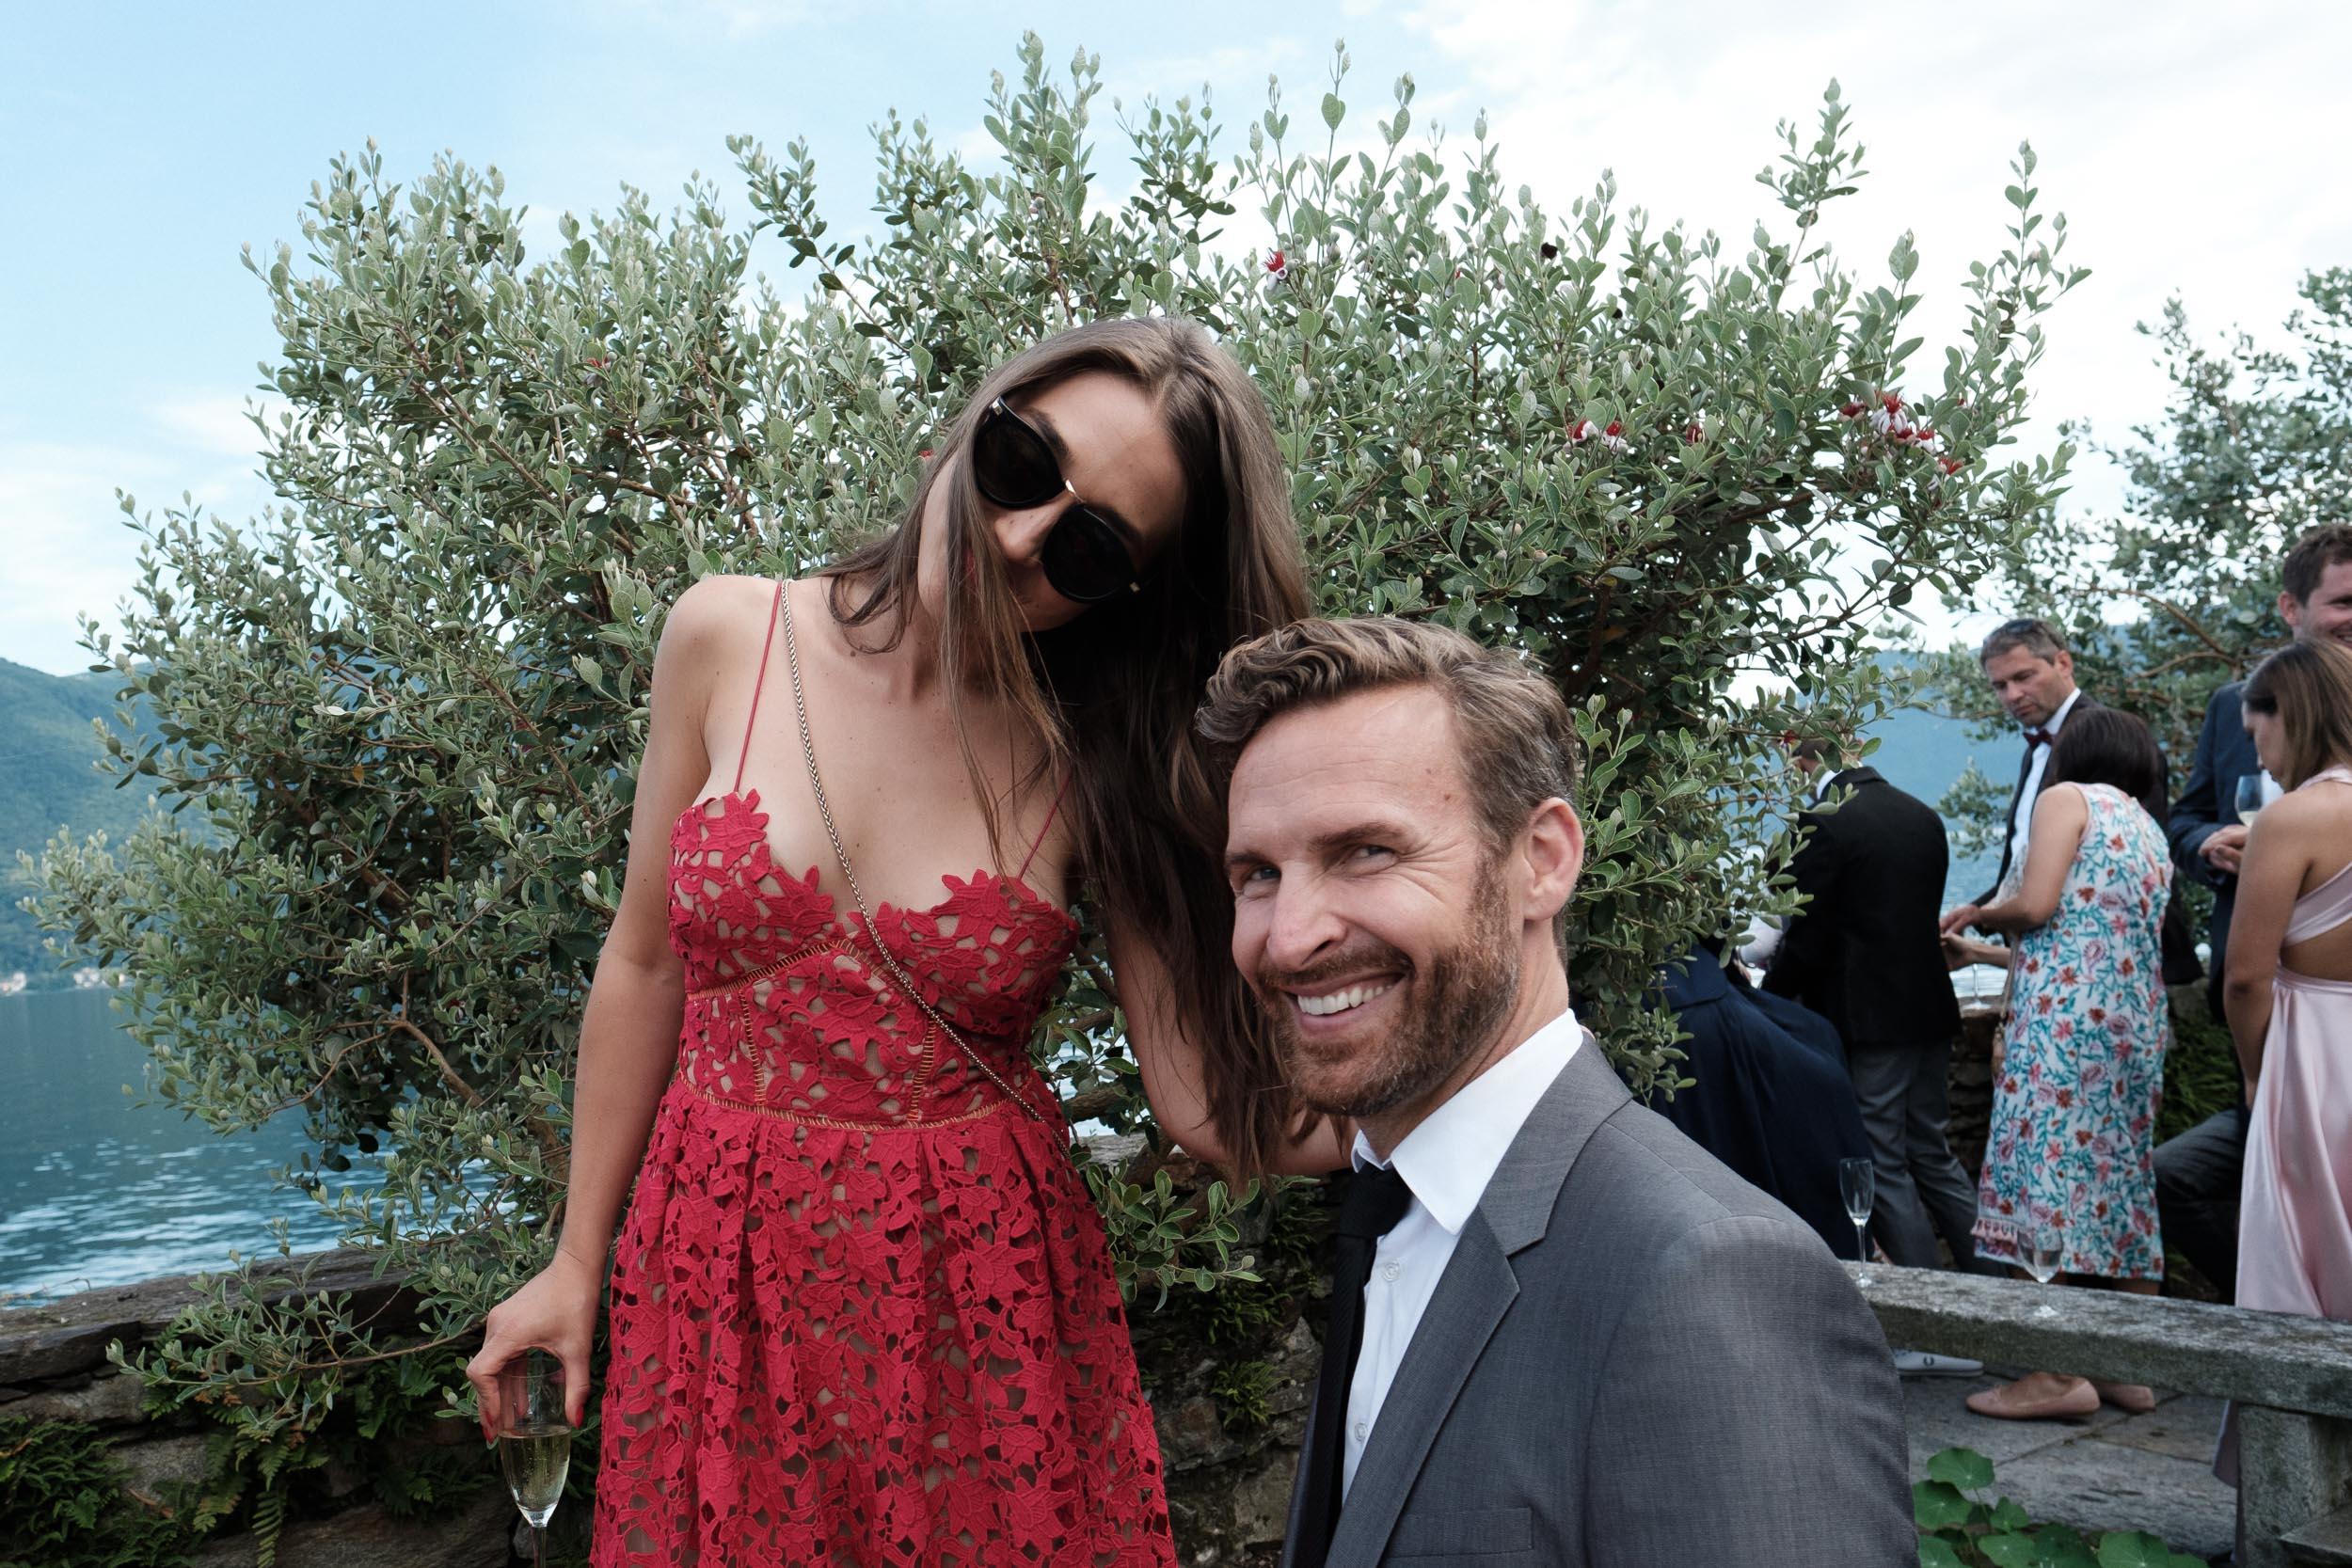 olivia-andreas-wedding-switzerland-371.jpg